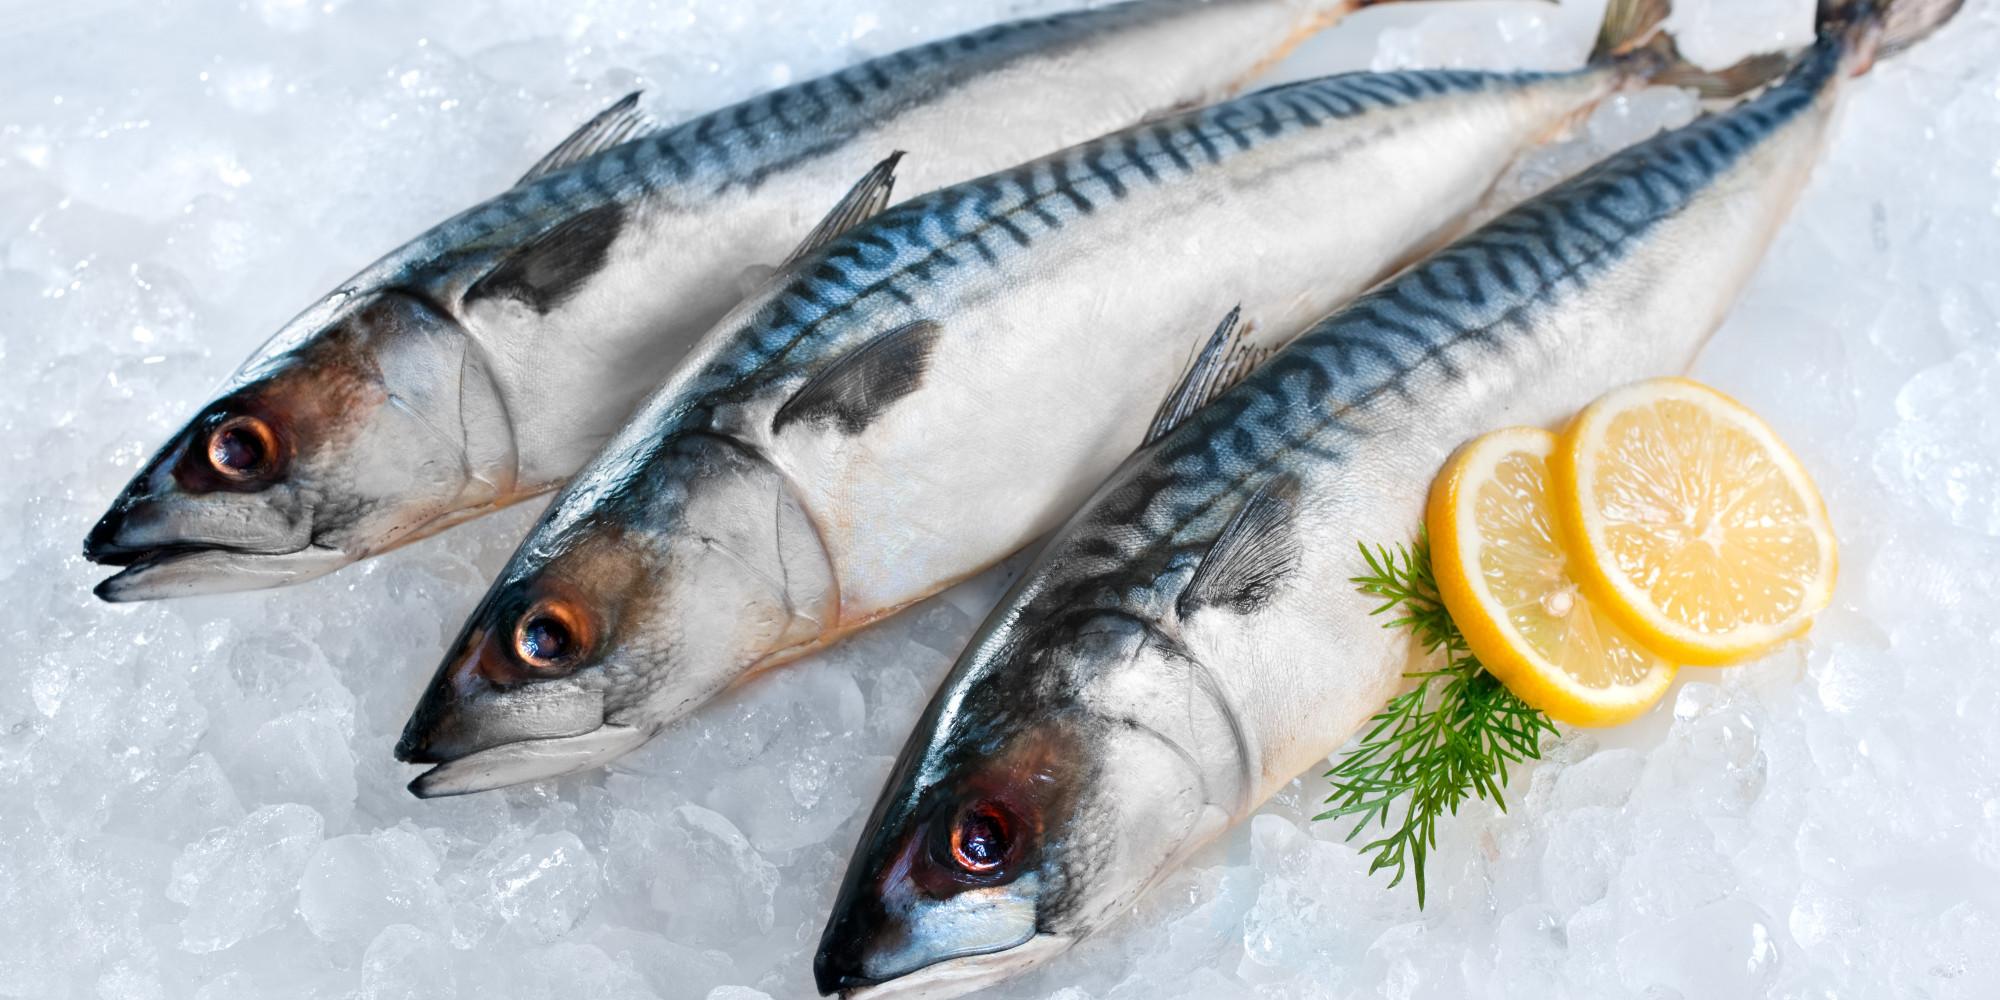 Uskumru - Scumbrians ailesinin balık 9